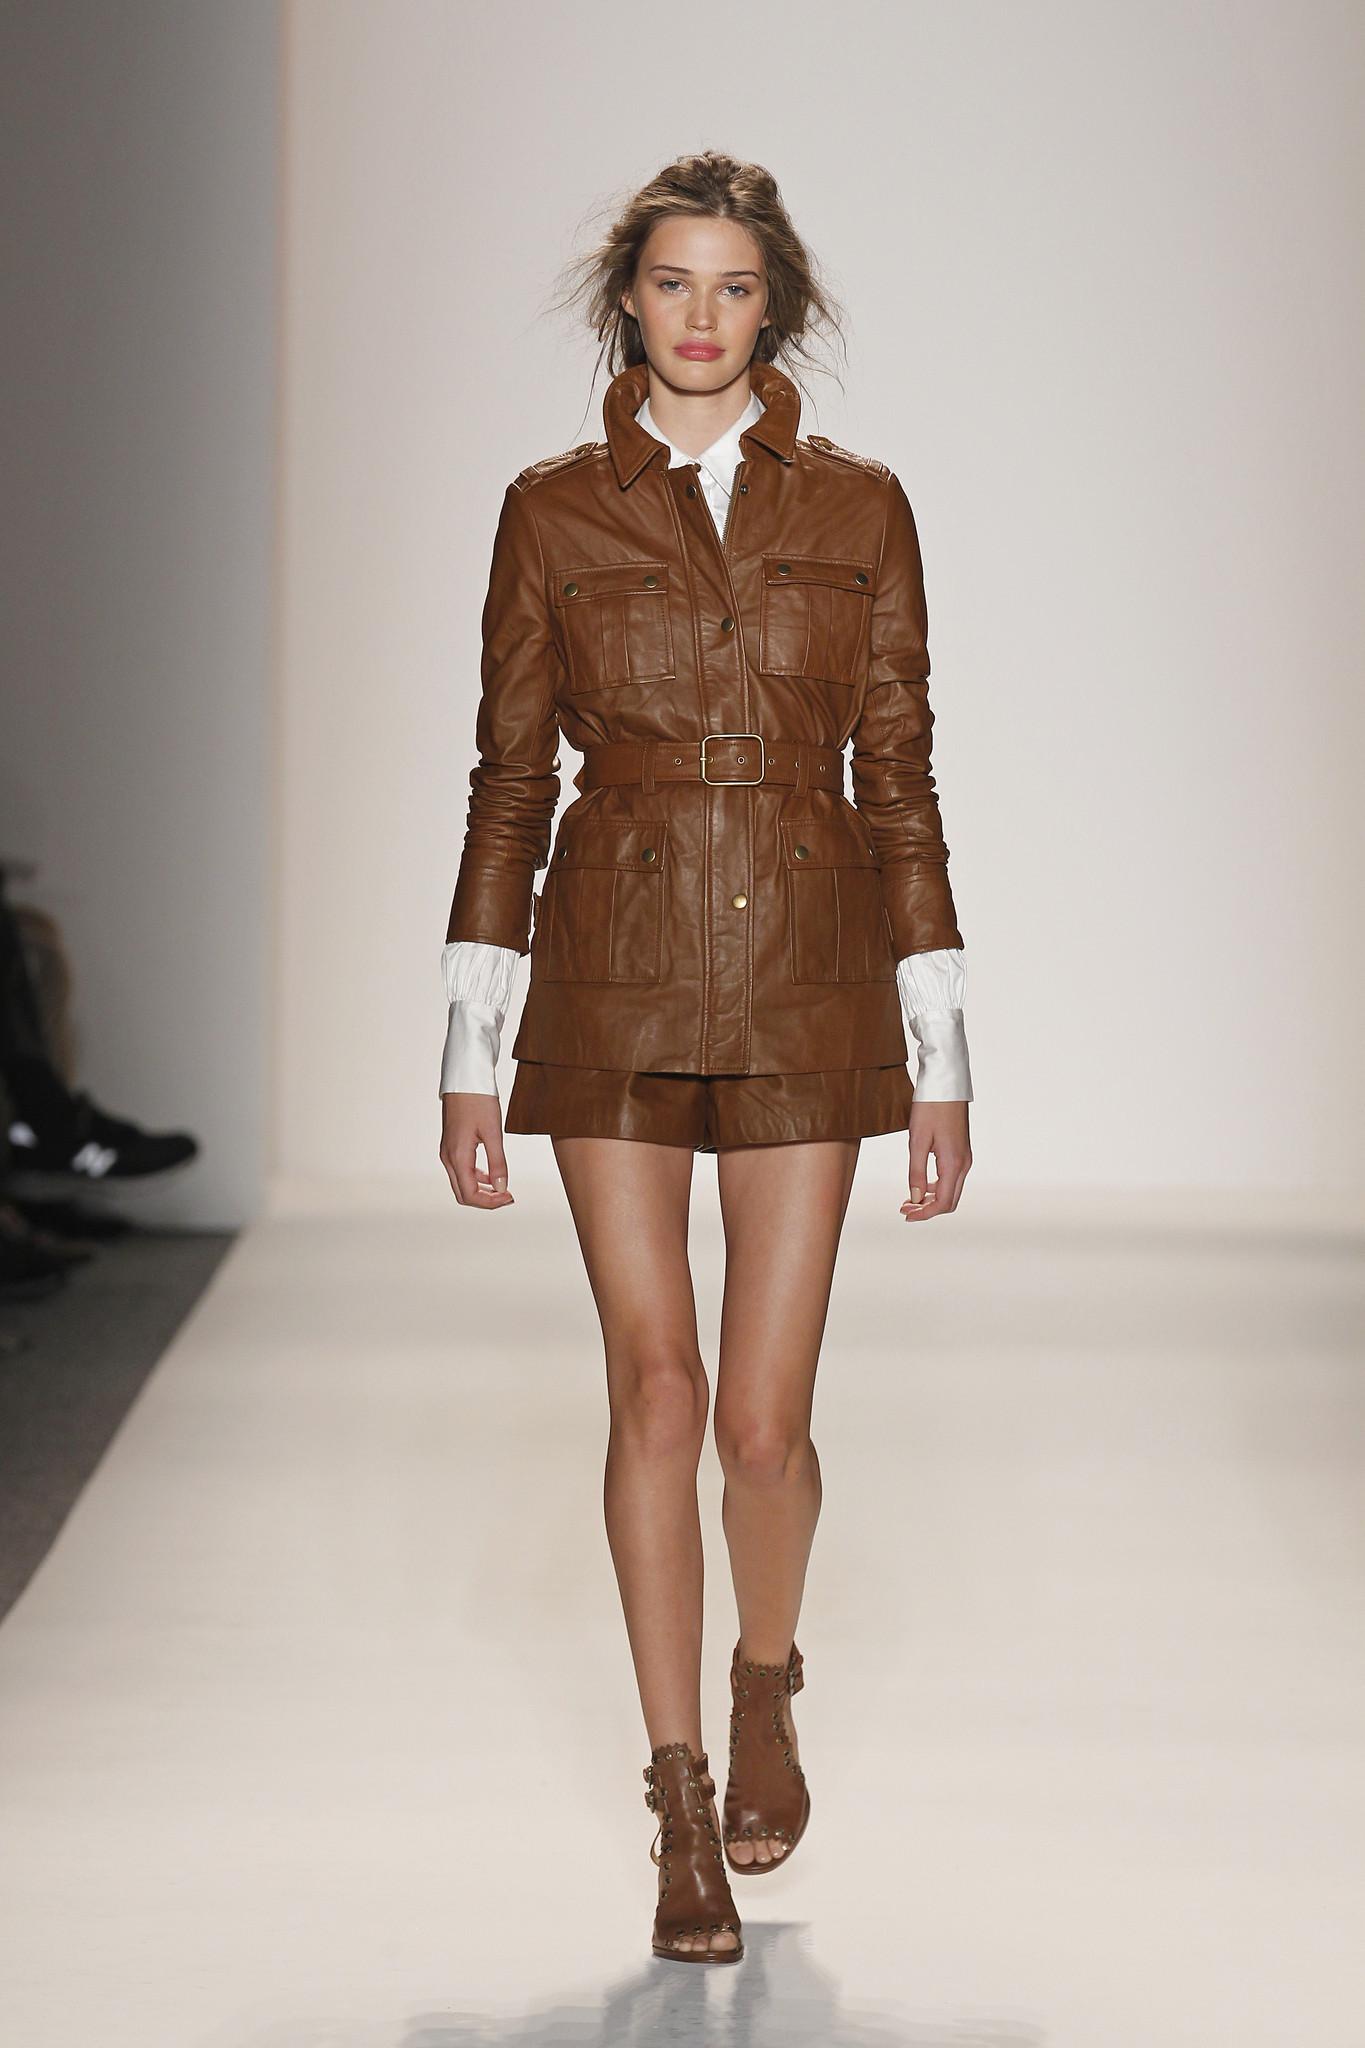 New York Fashion Week Spring 2014 Rachel Zoe Hartford Courant